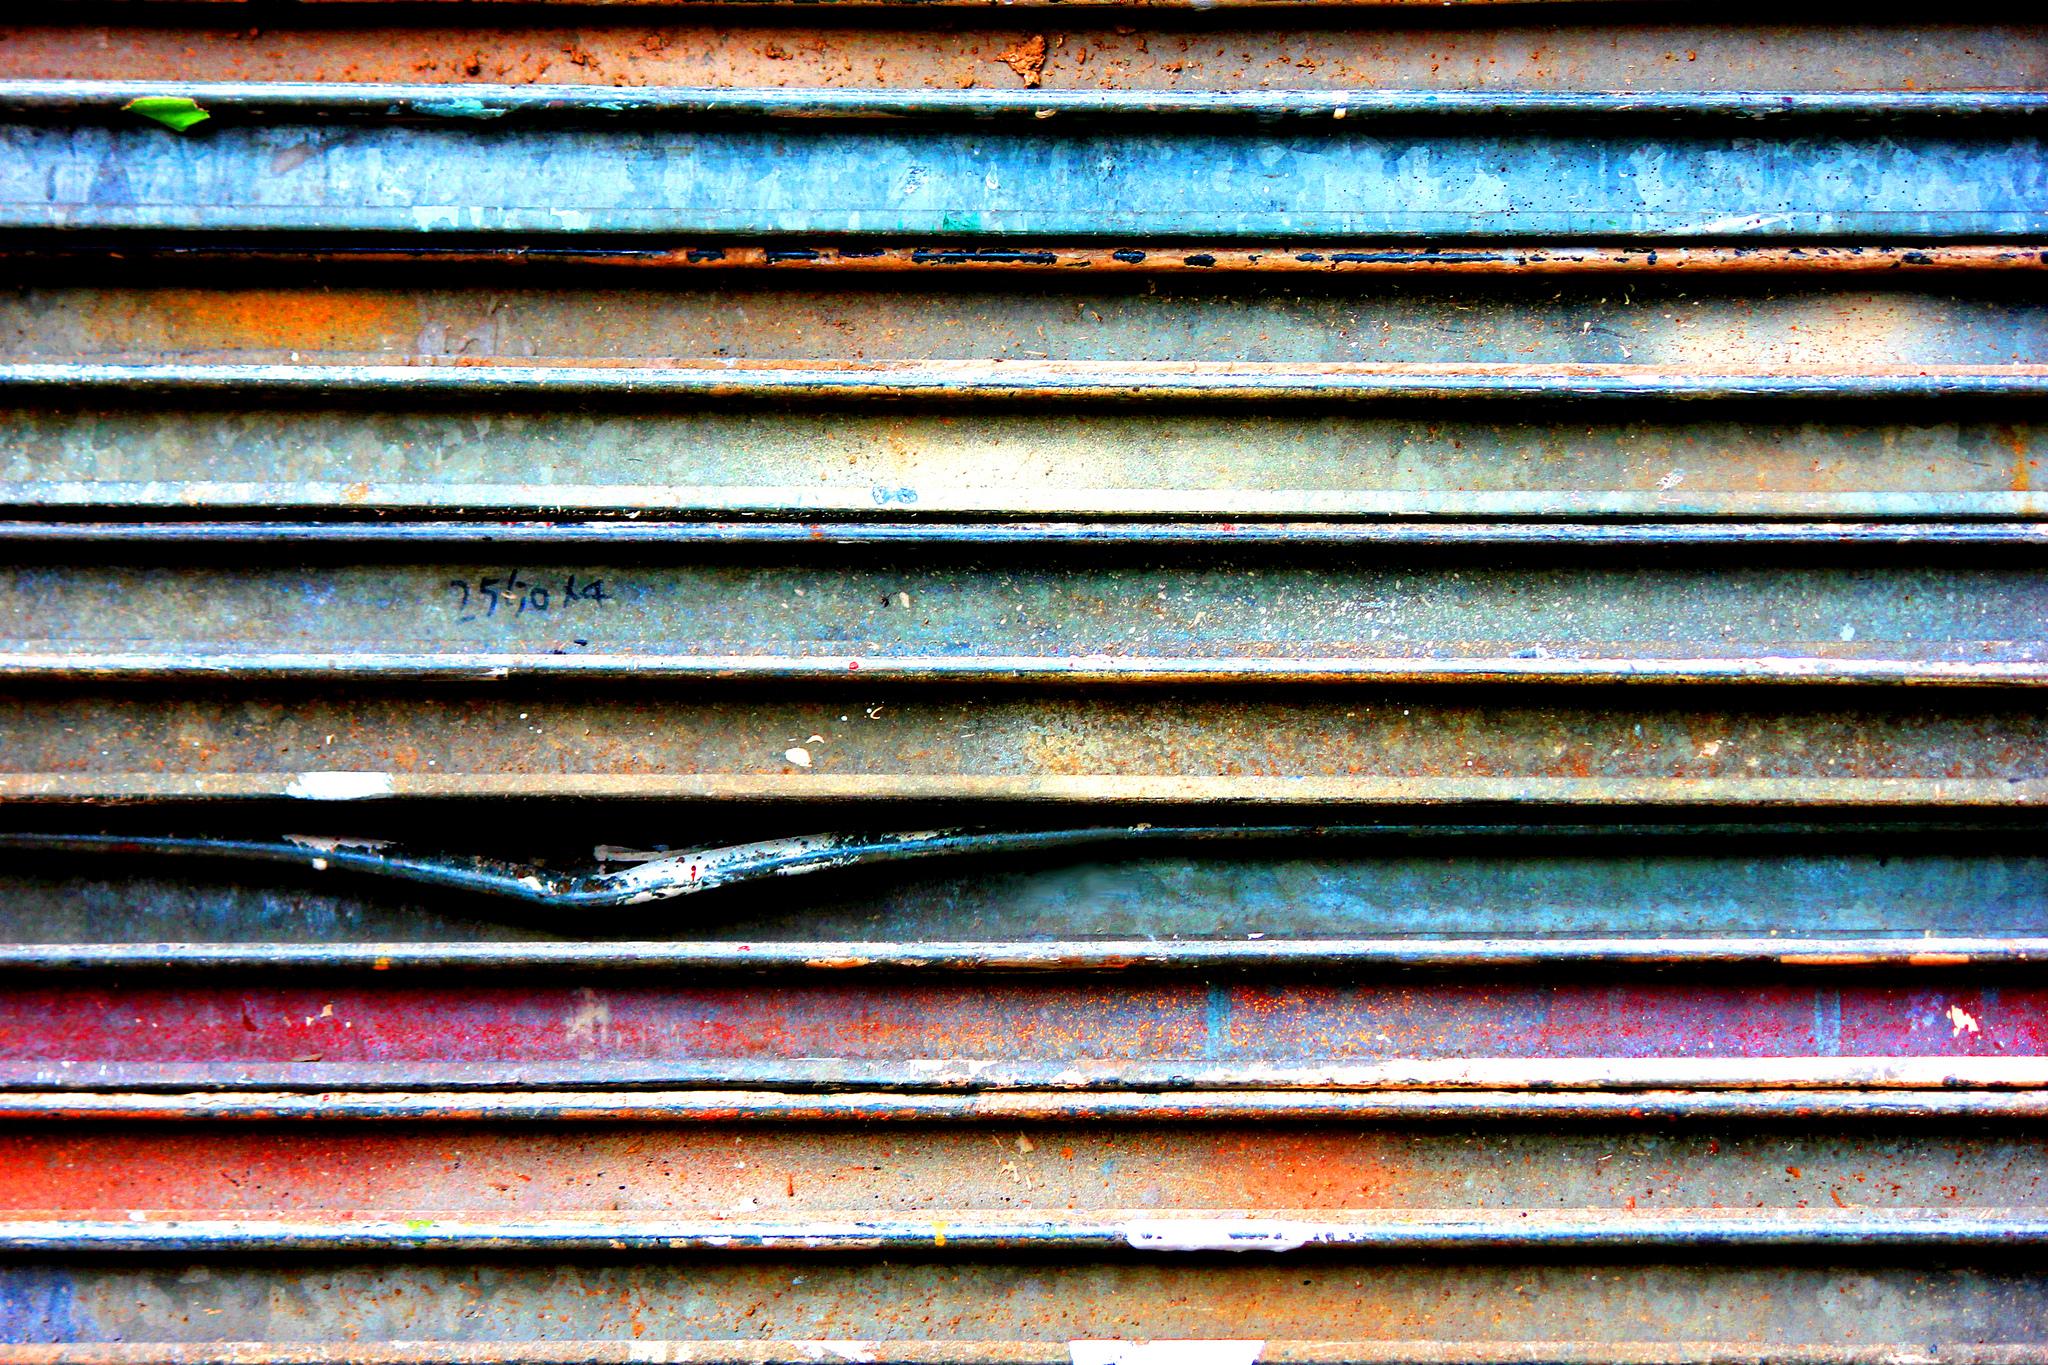 Abstract par tanakawho en cc sur Flickr : https://www.flickr.com/photos/28481088@N00/8685945832/